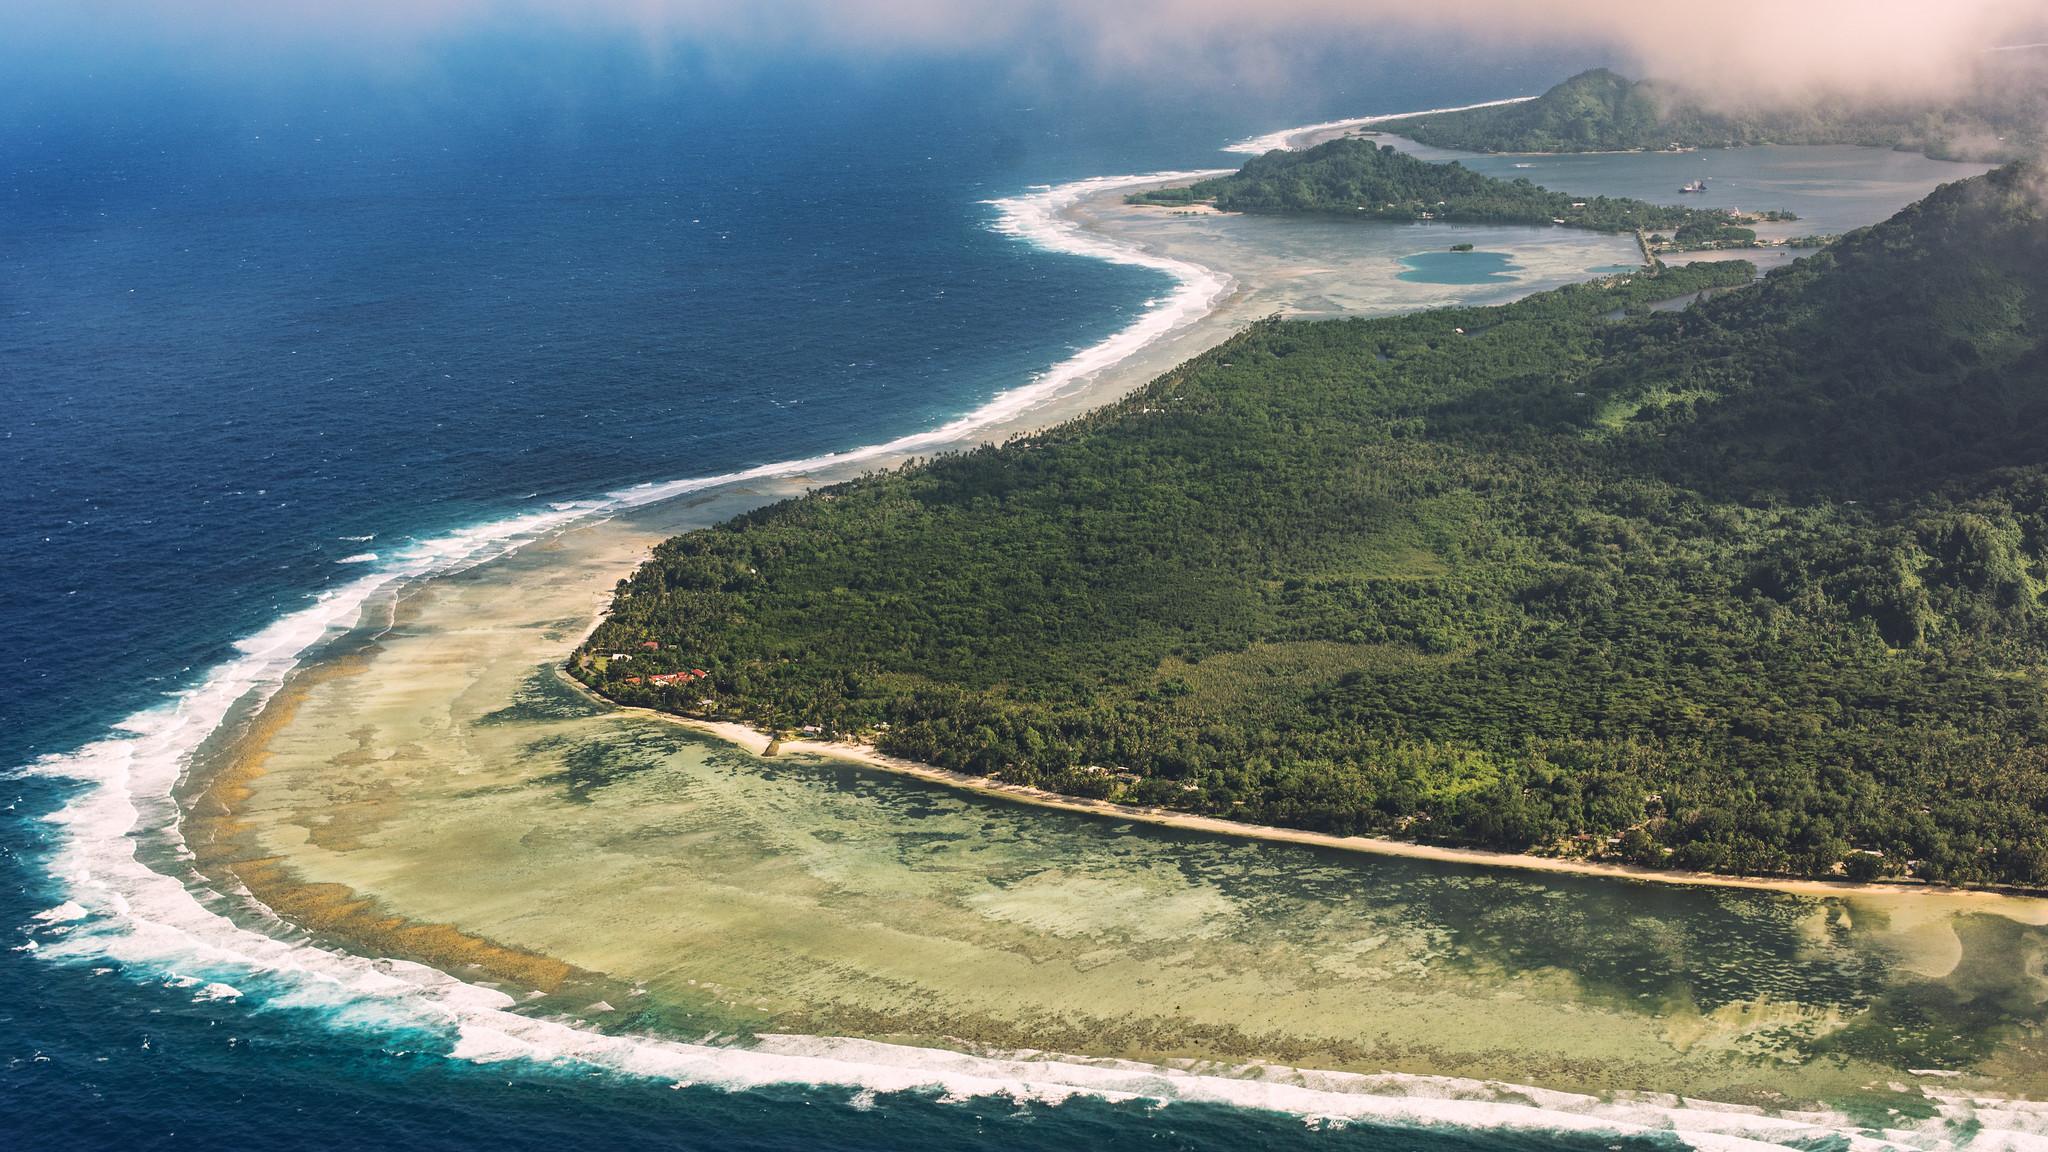 Pohnpei Coastline